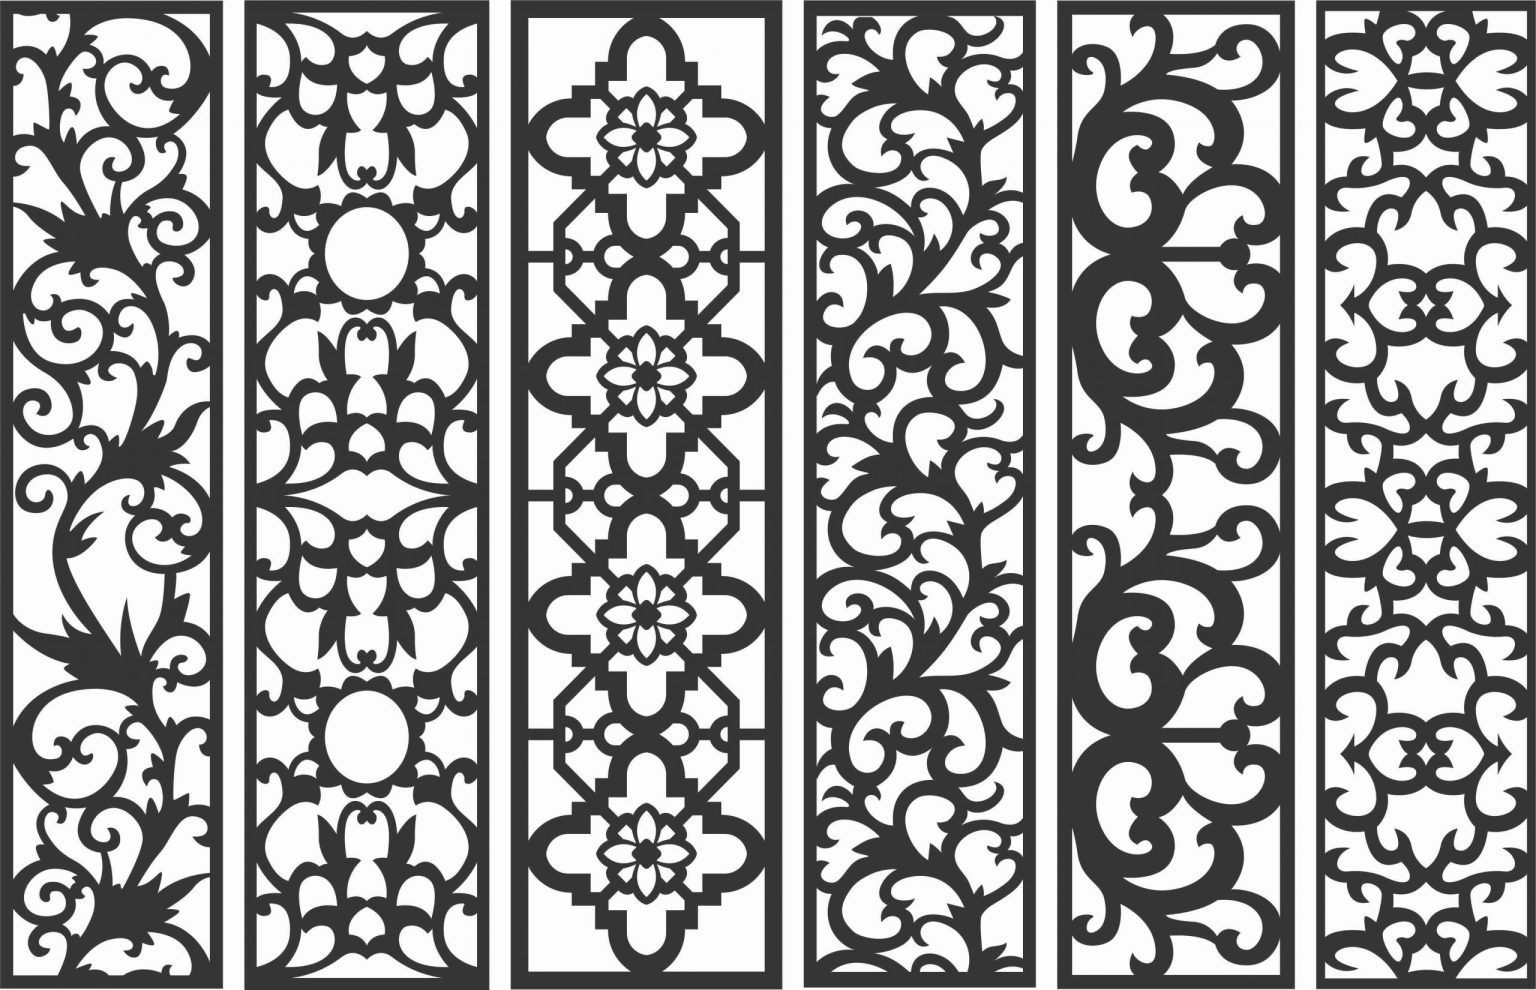 Screen Panel Patterns Seamless 65 Free DXF File